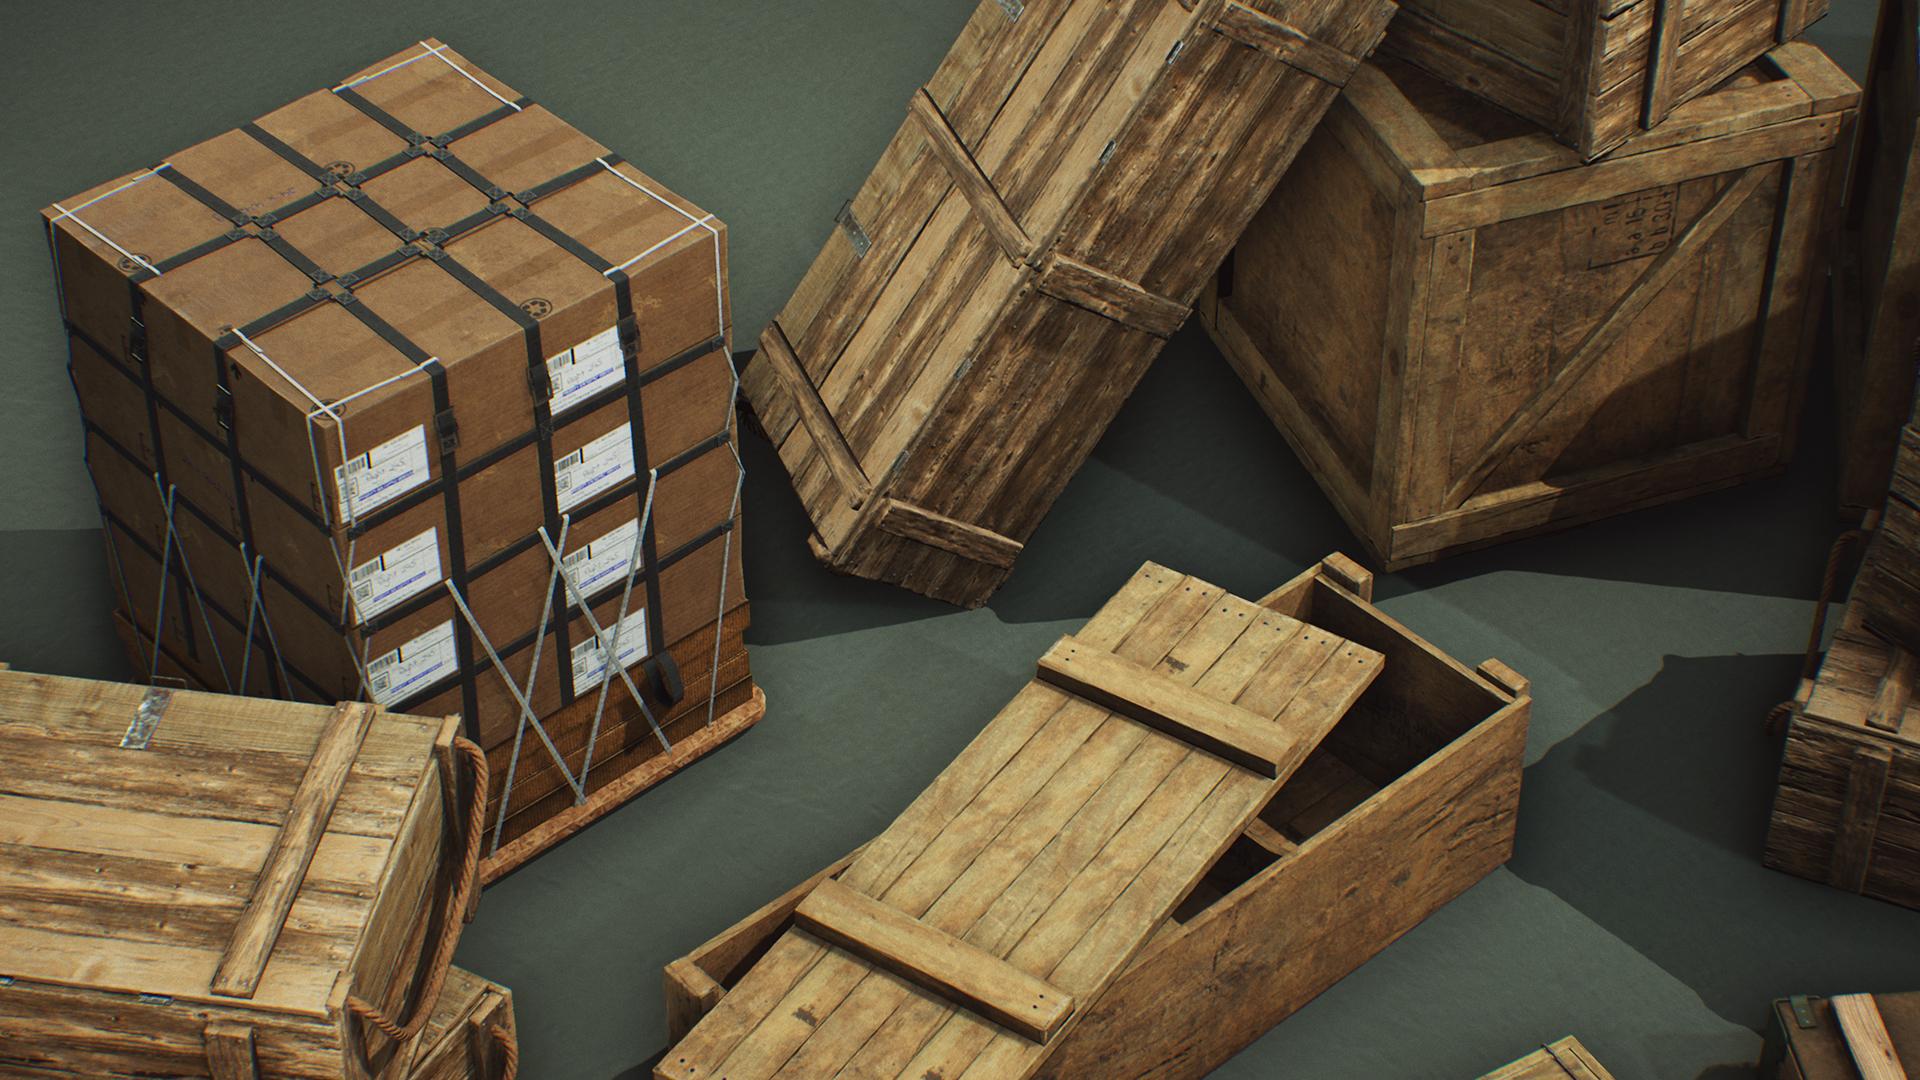 Military Supplies - VOL 6 - Crates by Dekogon Studios in